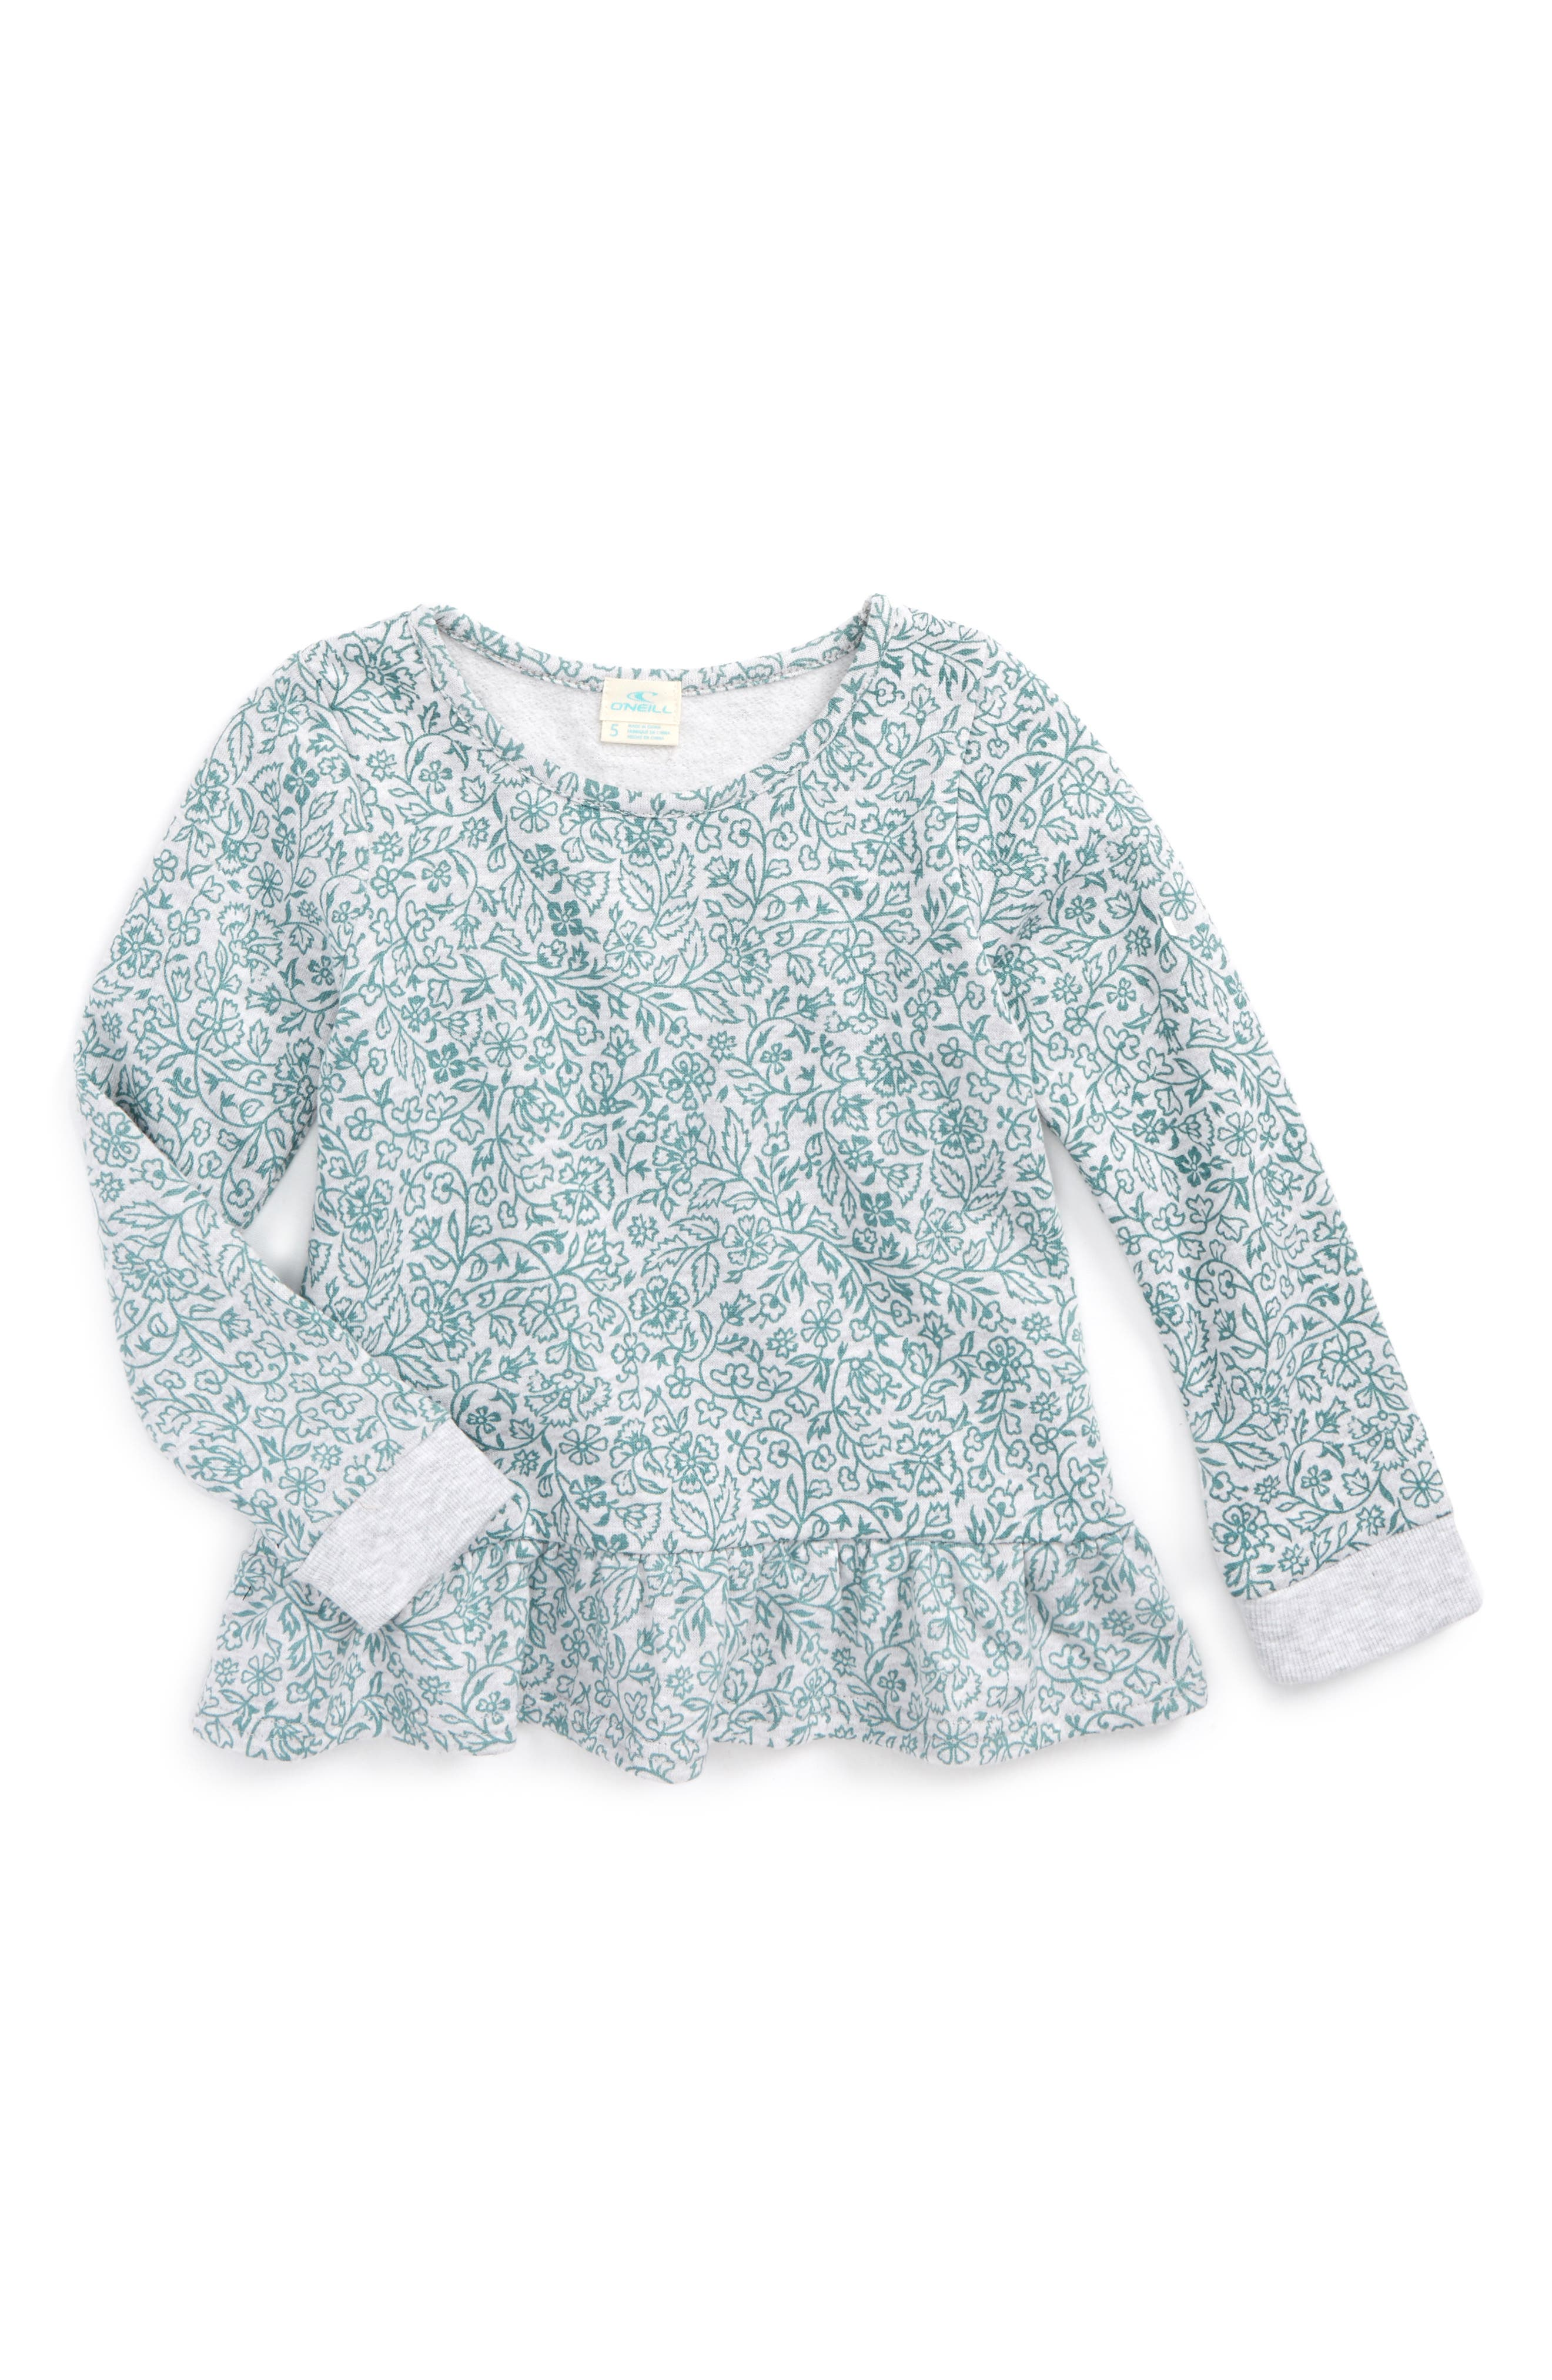 Loveland Fleece Sweatshirt,                         Main,                         color, 030